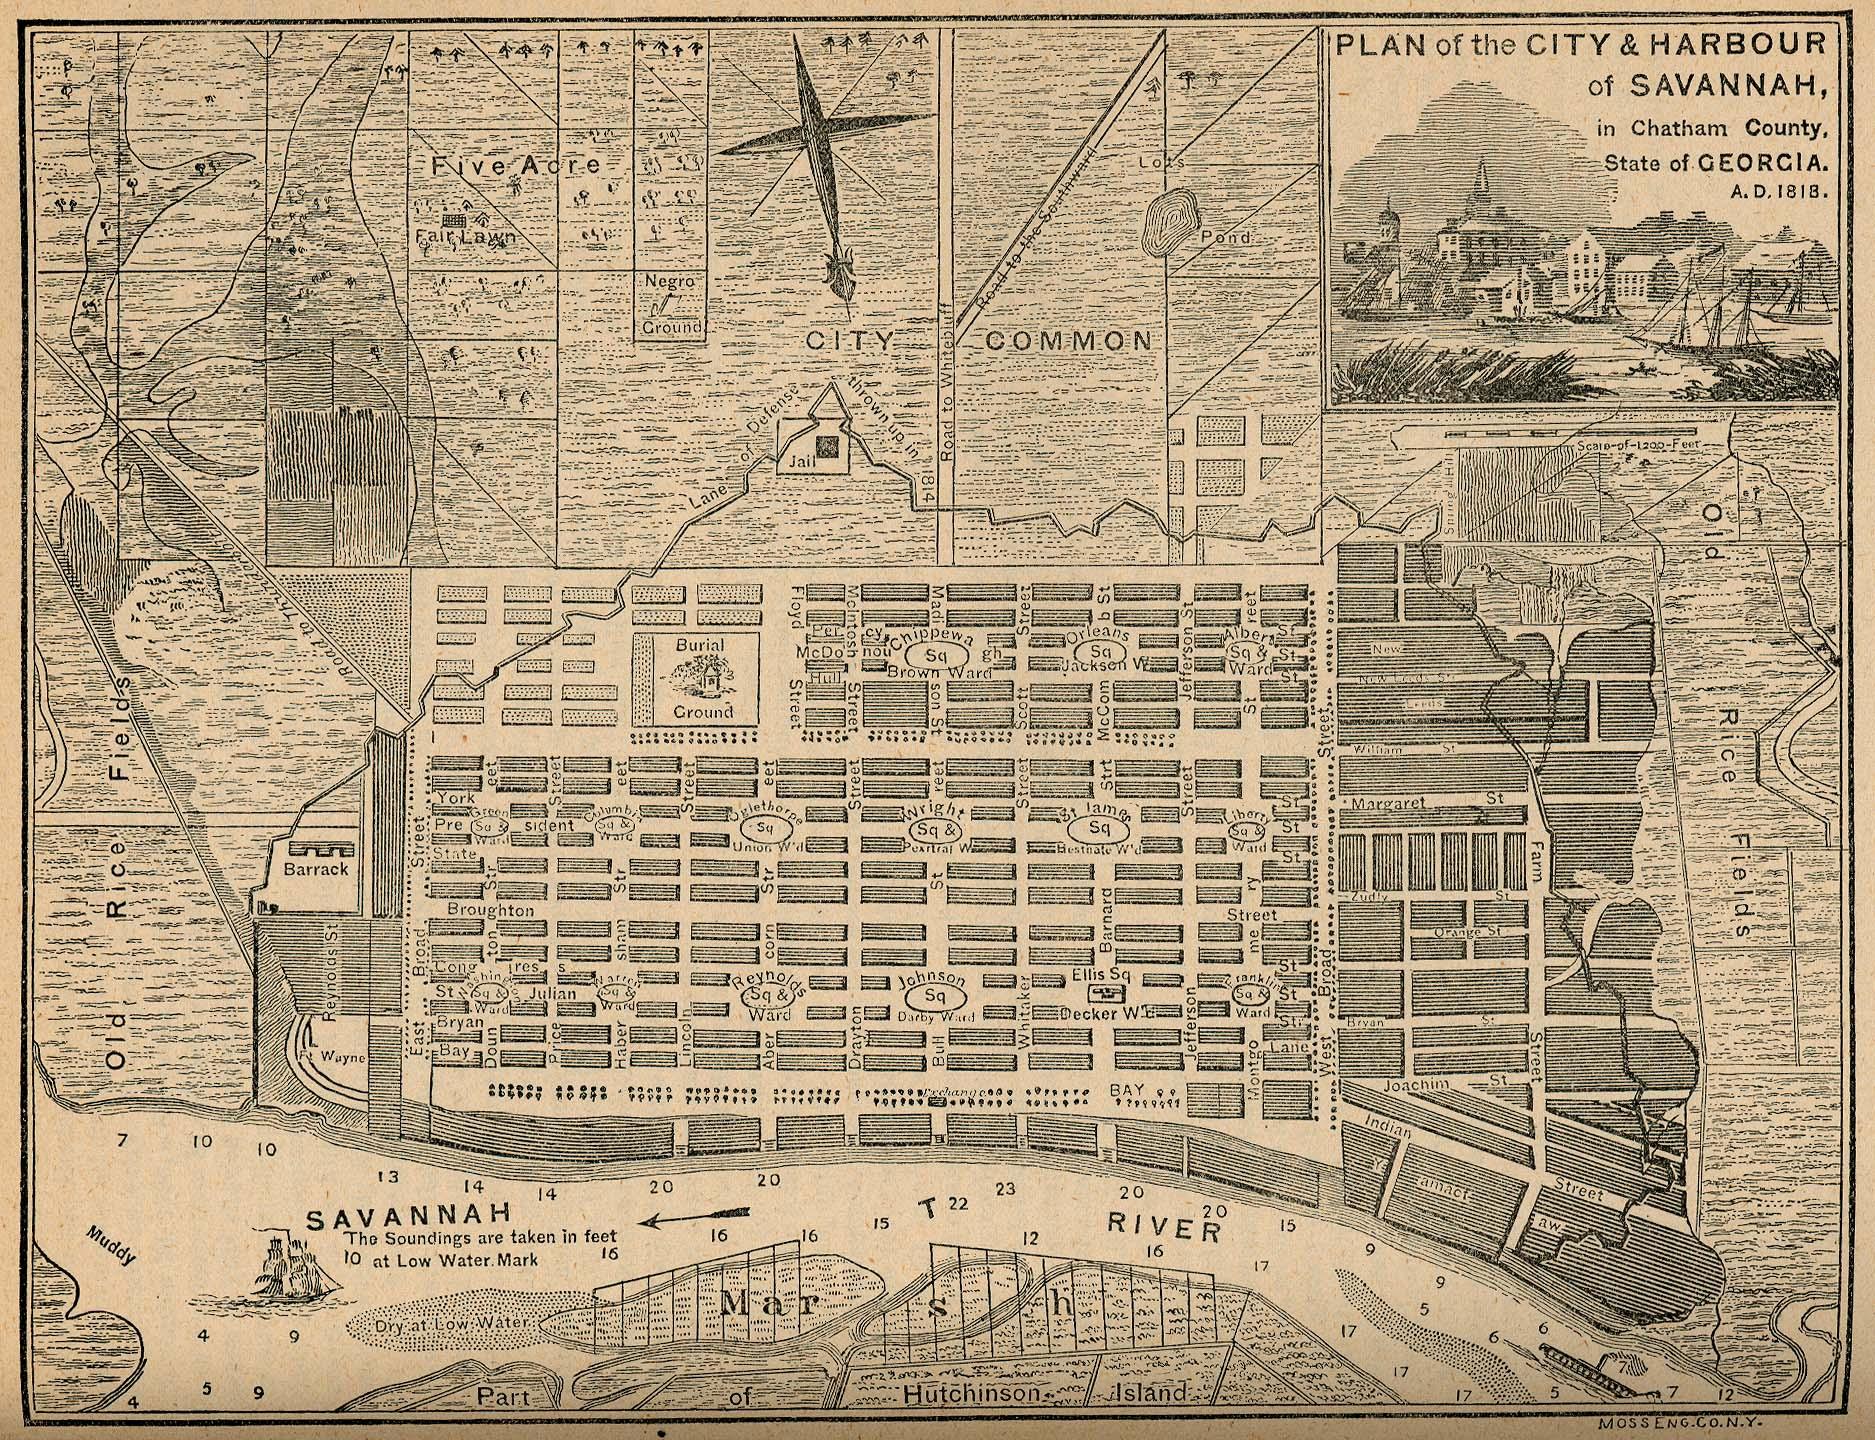 Savannah_cityplan_1818.jpg